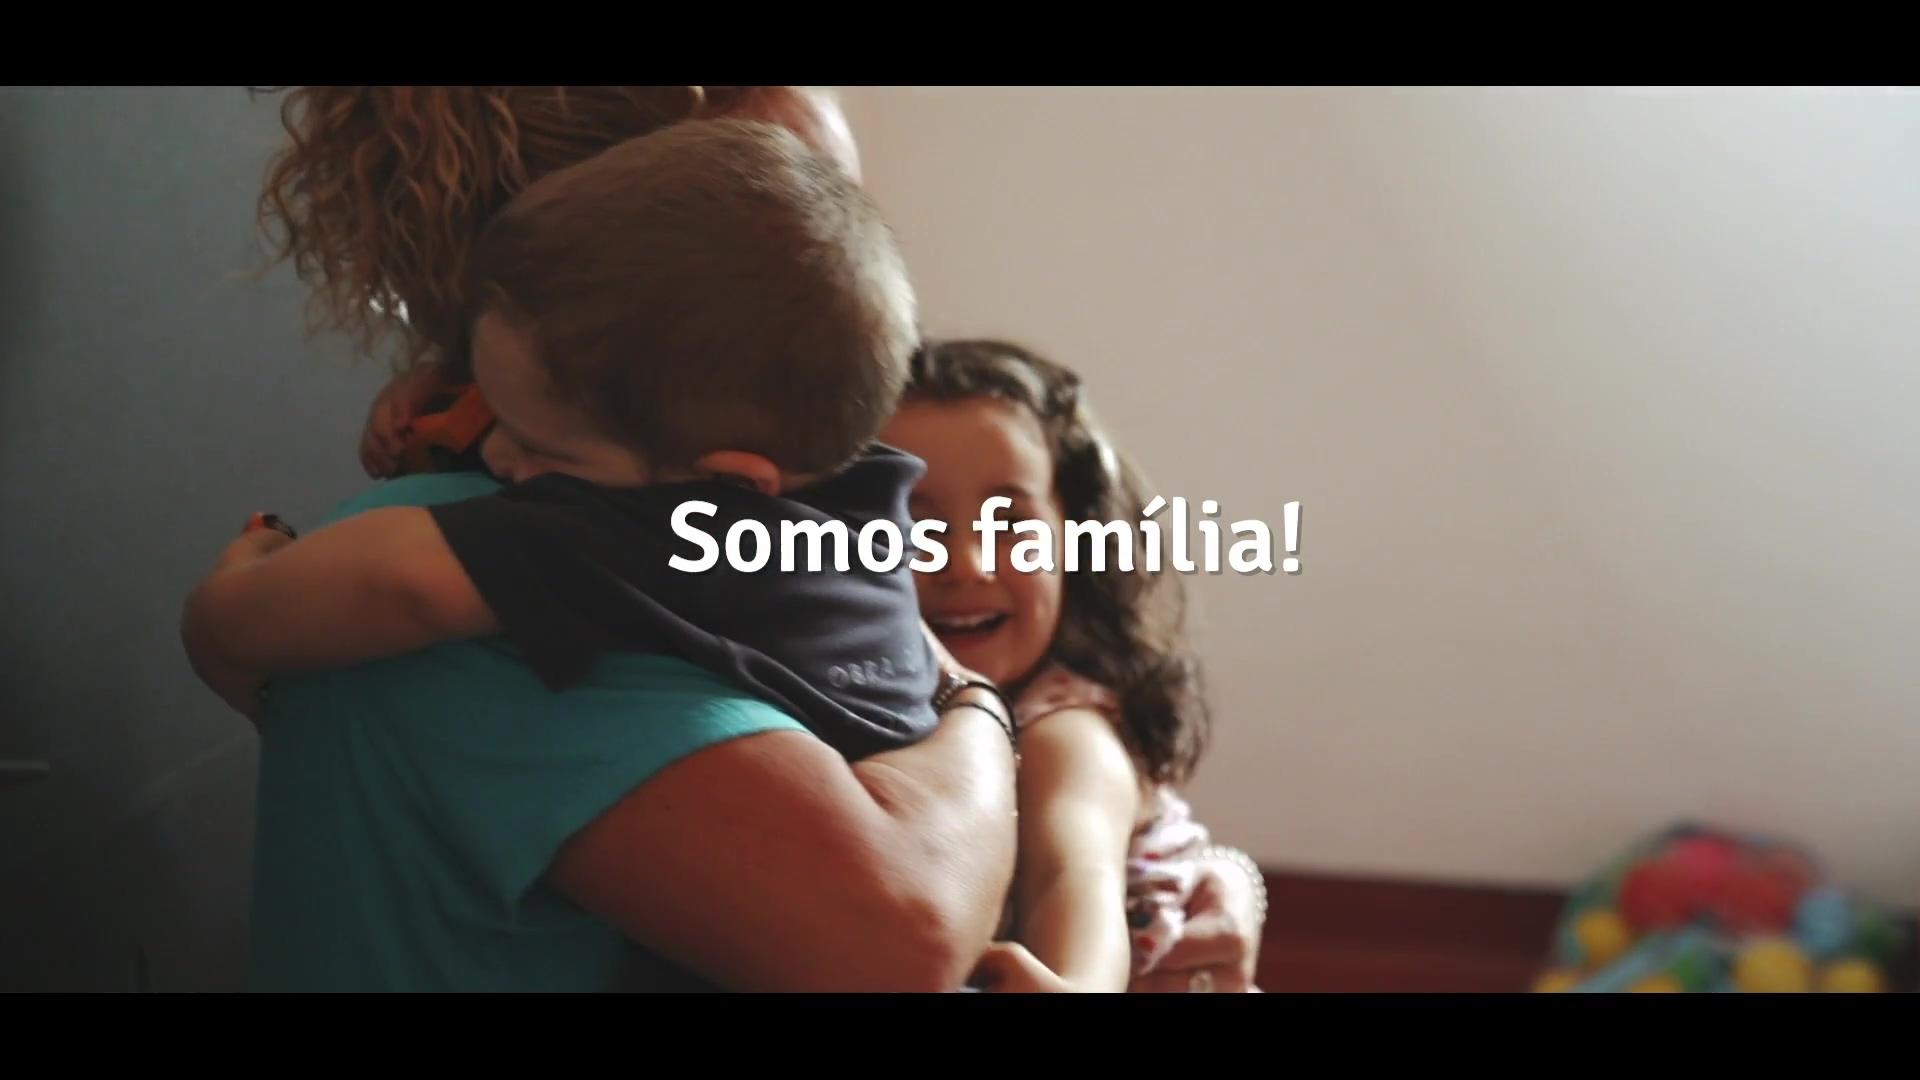 English For Life | Somos Familia